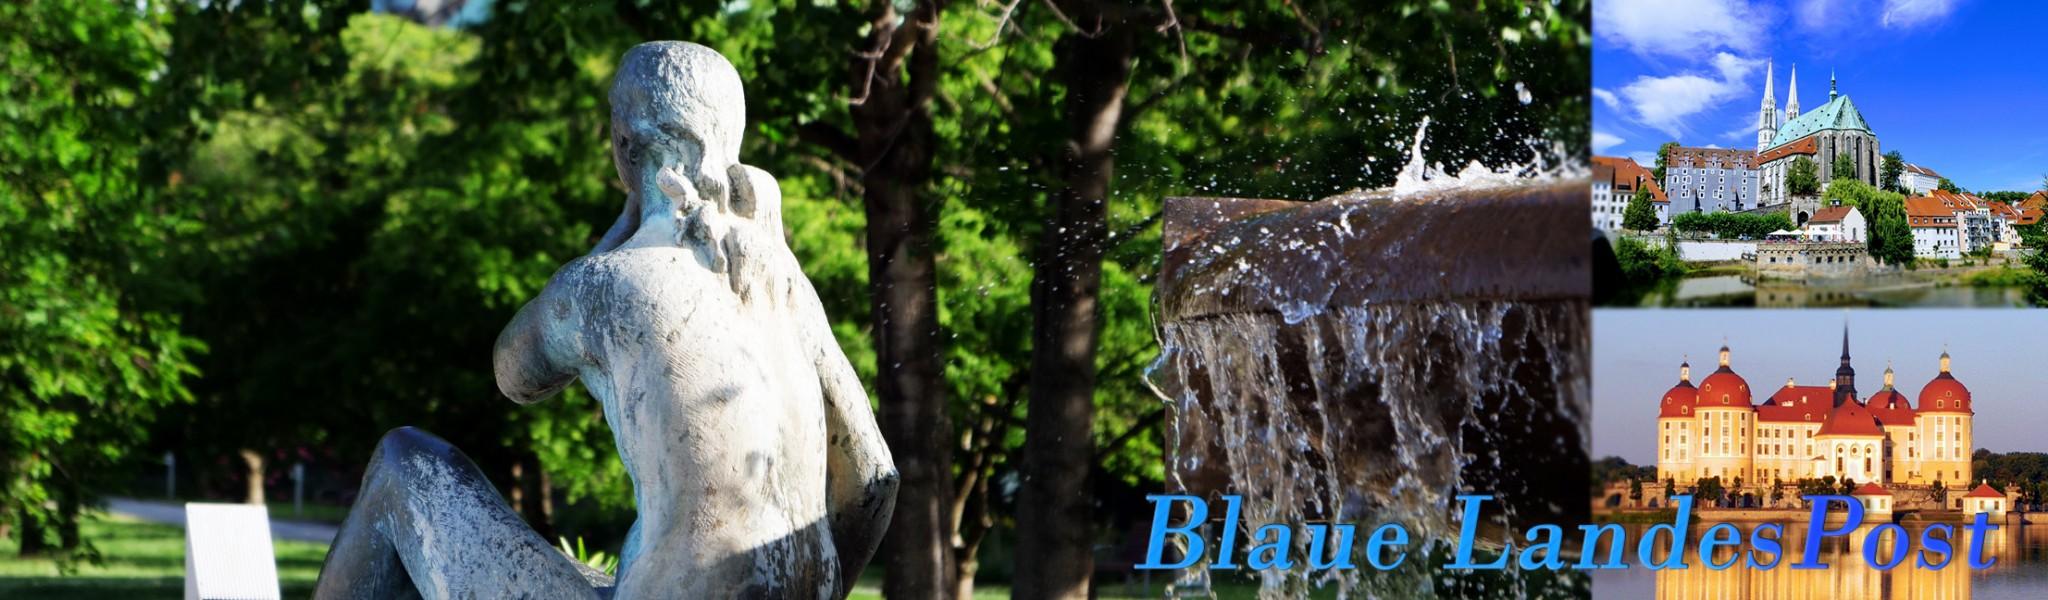 Blaue Landespost